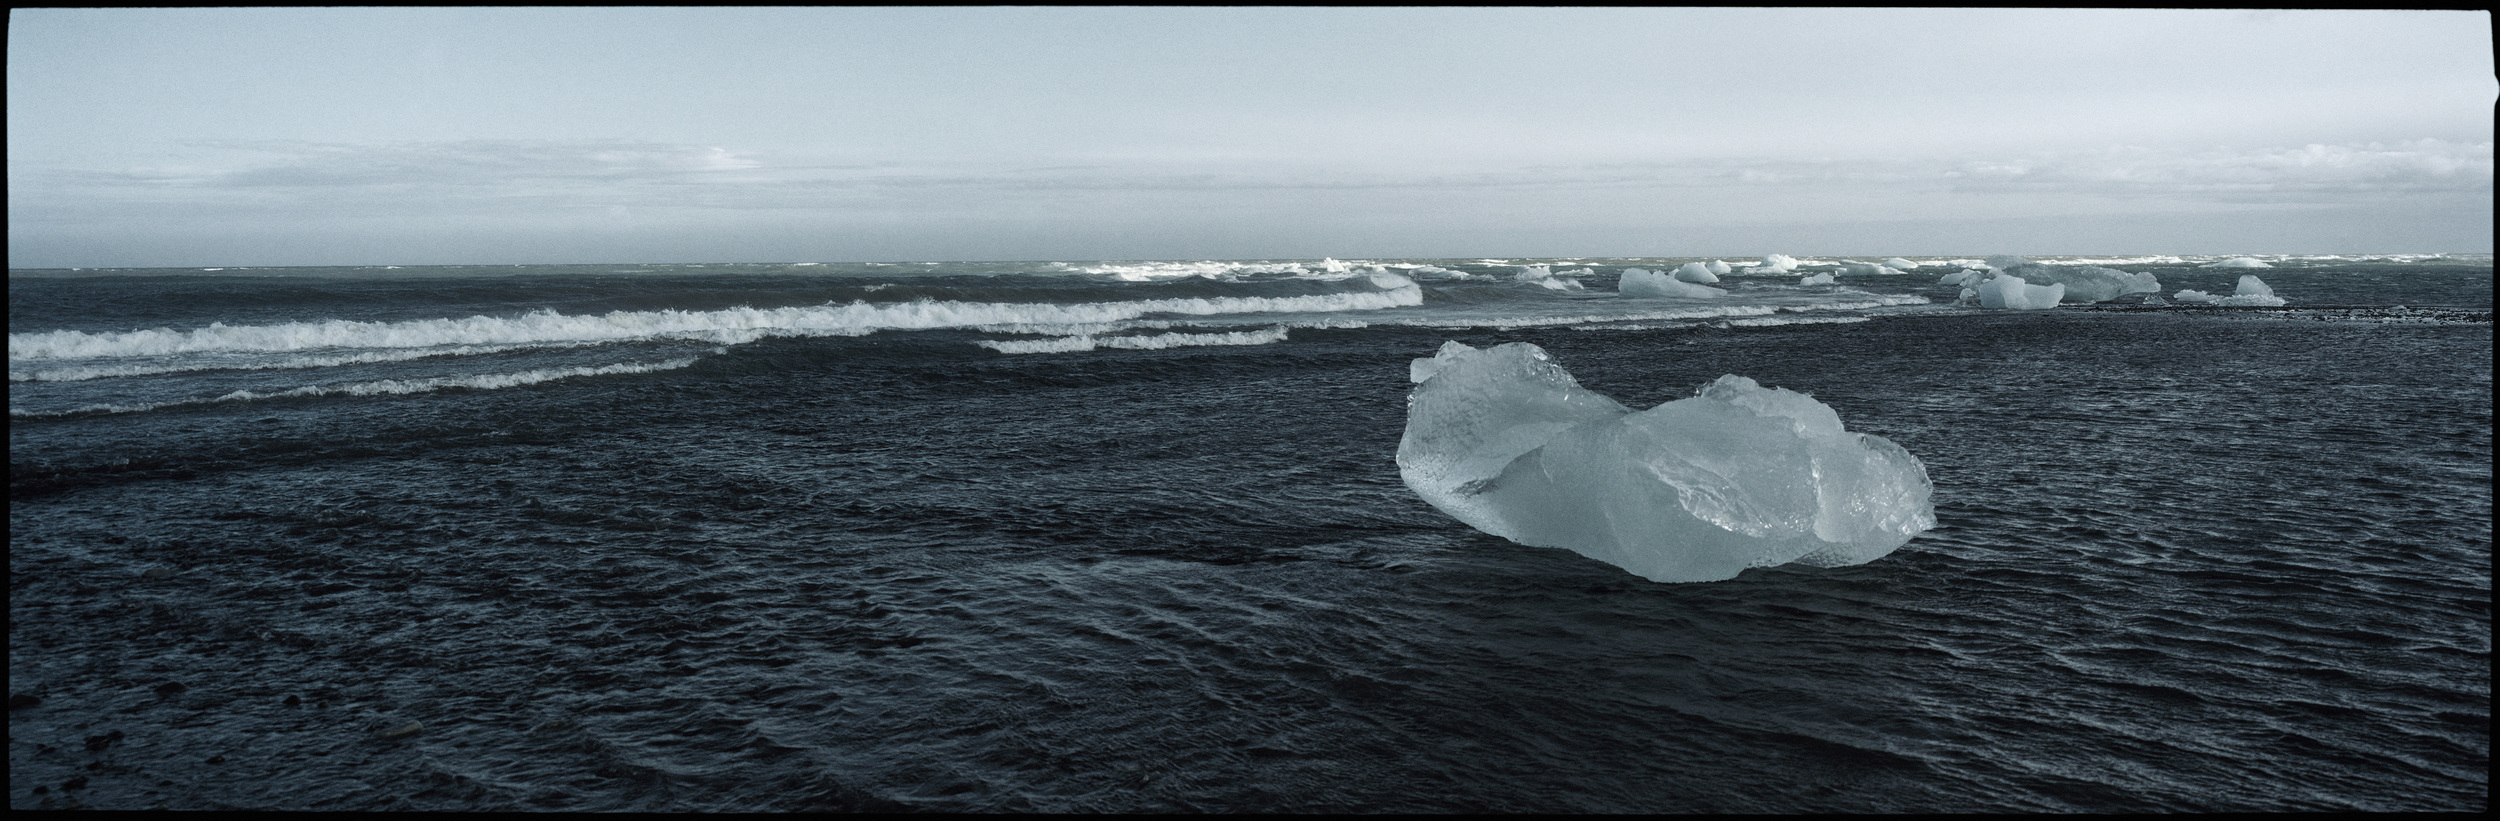 06.The Atlantic Ocean, washes back the icebergs drifting down from Jökulsárlón.